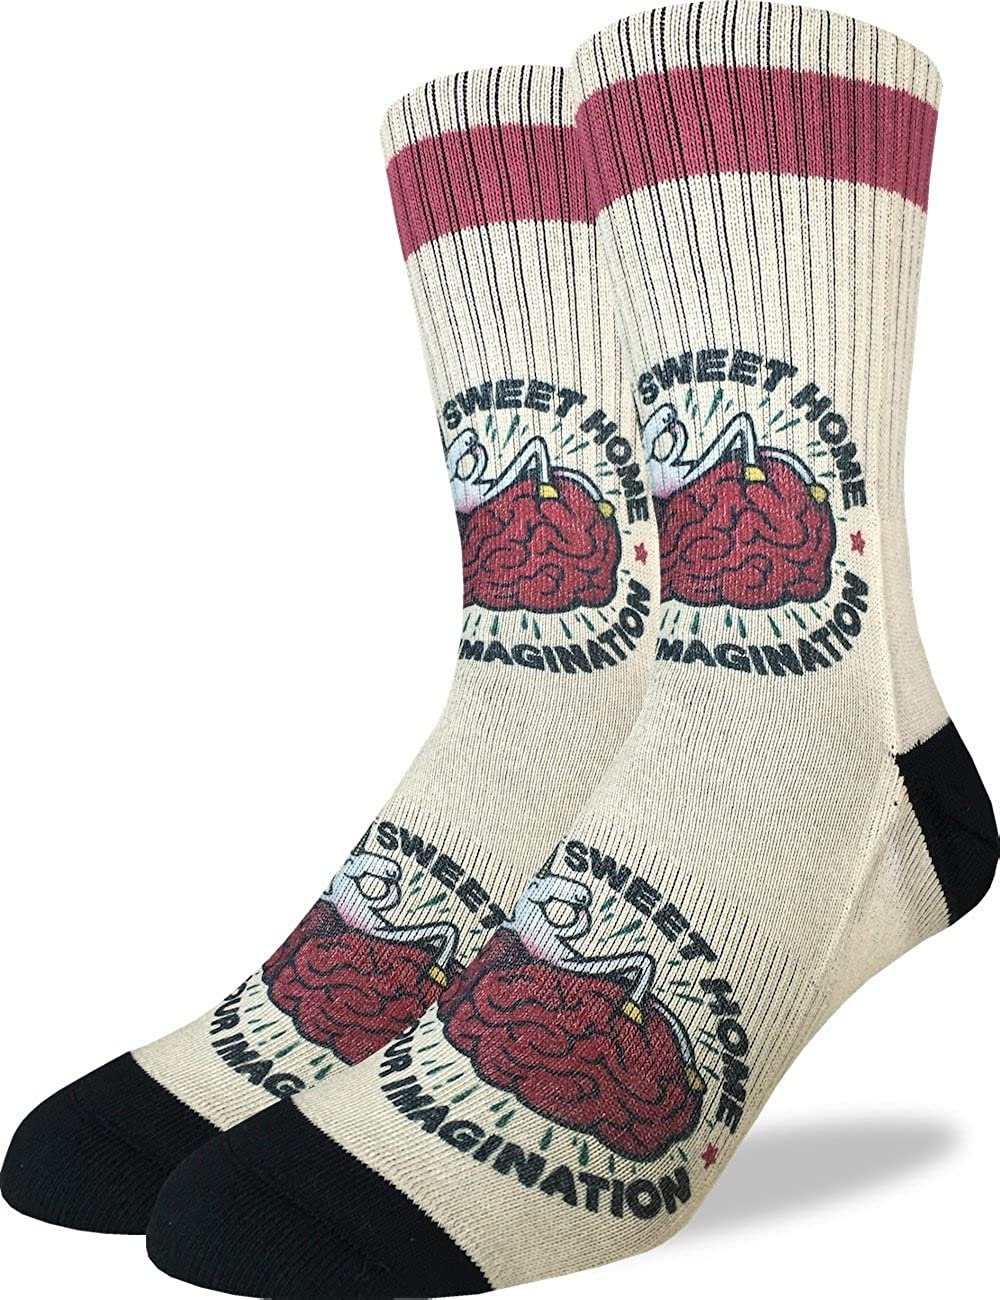 Yellow Good Luck Sock Mens Imaginary Unicorn Crew Socks Adult Shoe Size 8-13